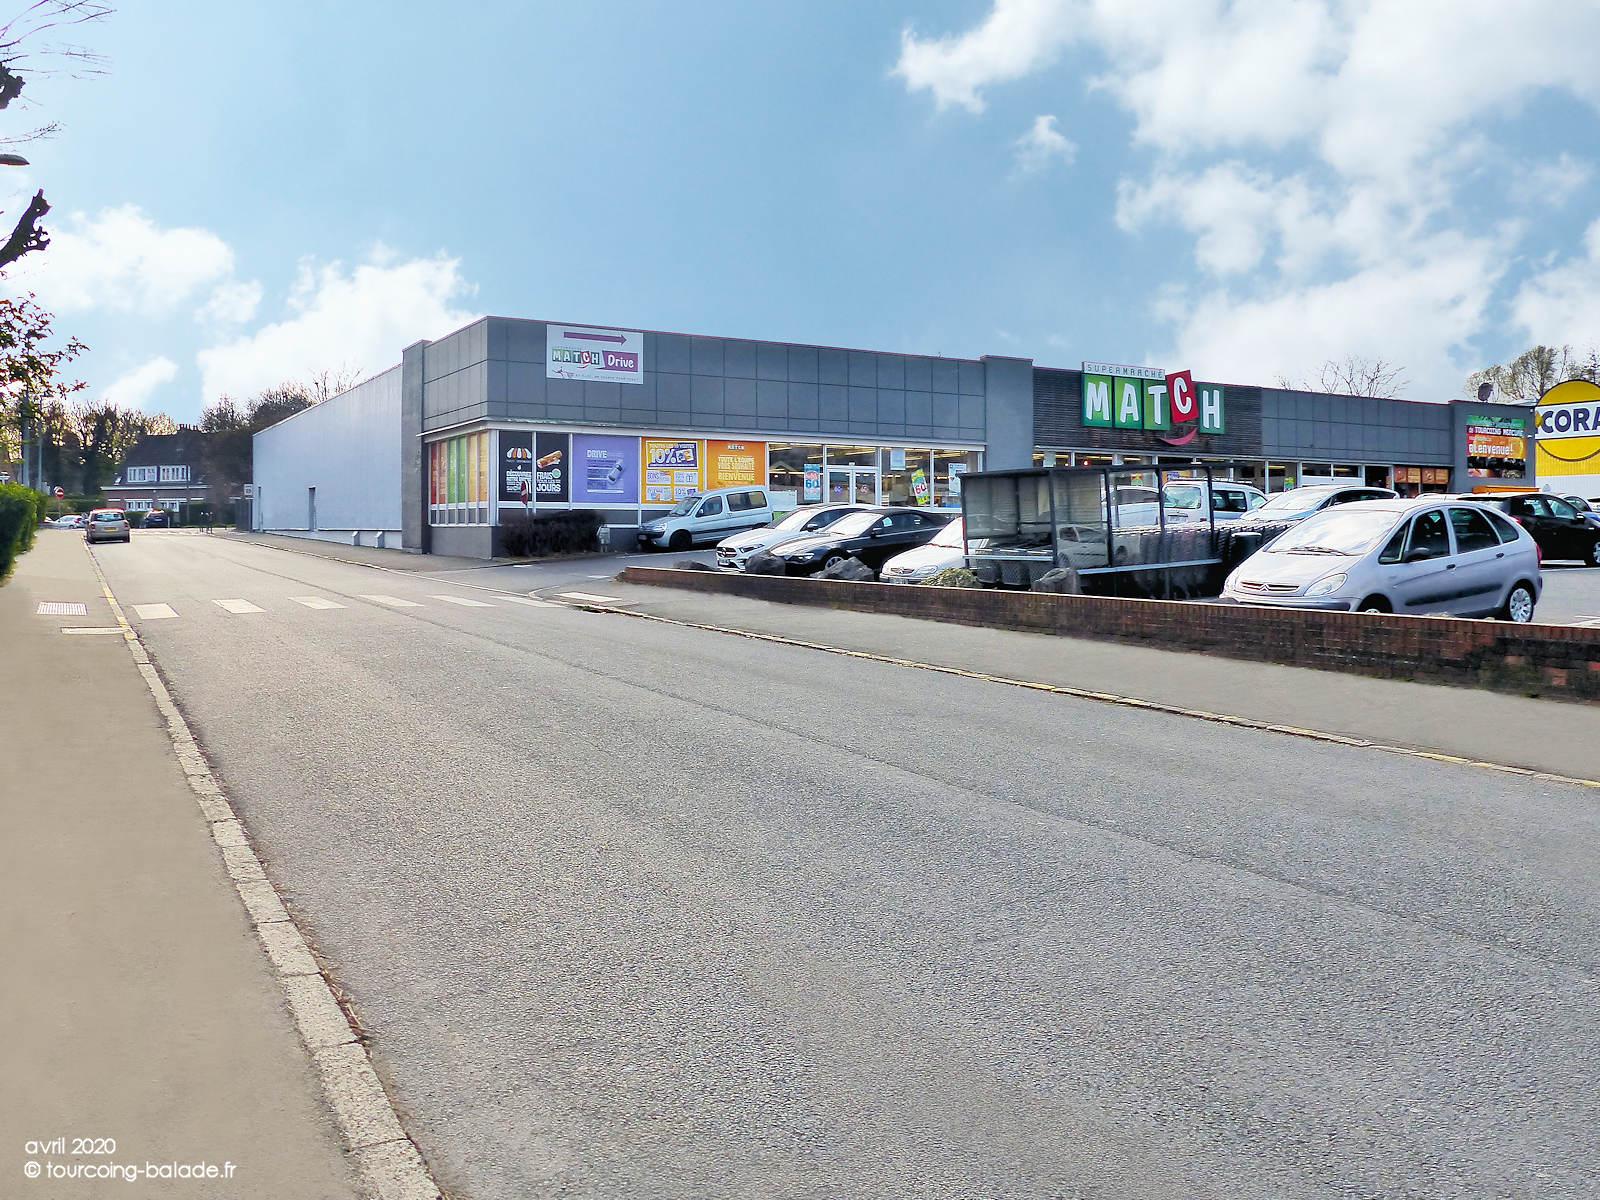 Supermarché Match Mercure, Rue du Canal, Tourcoing